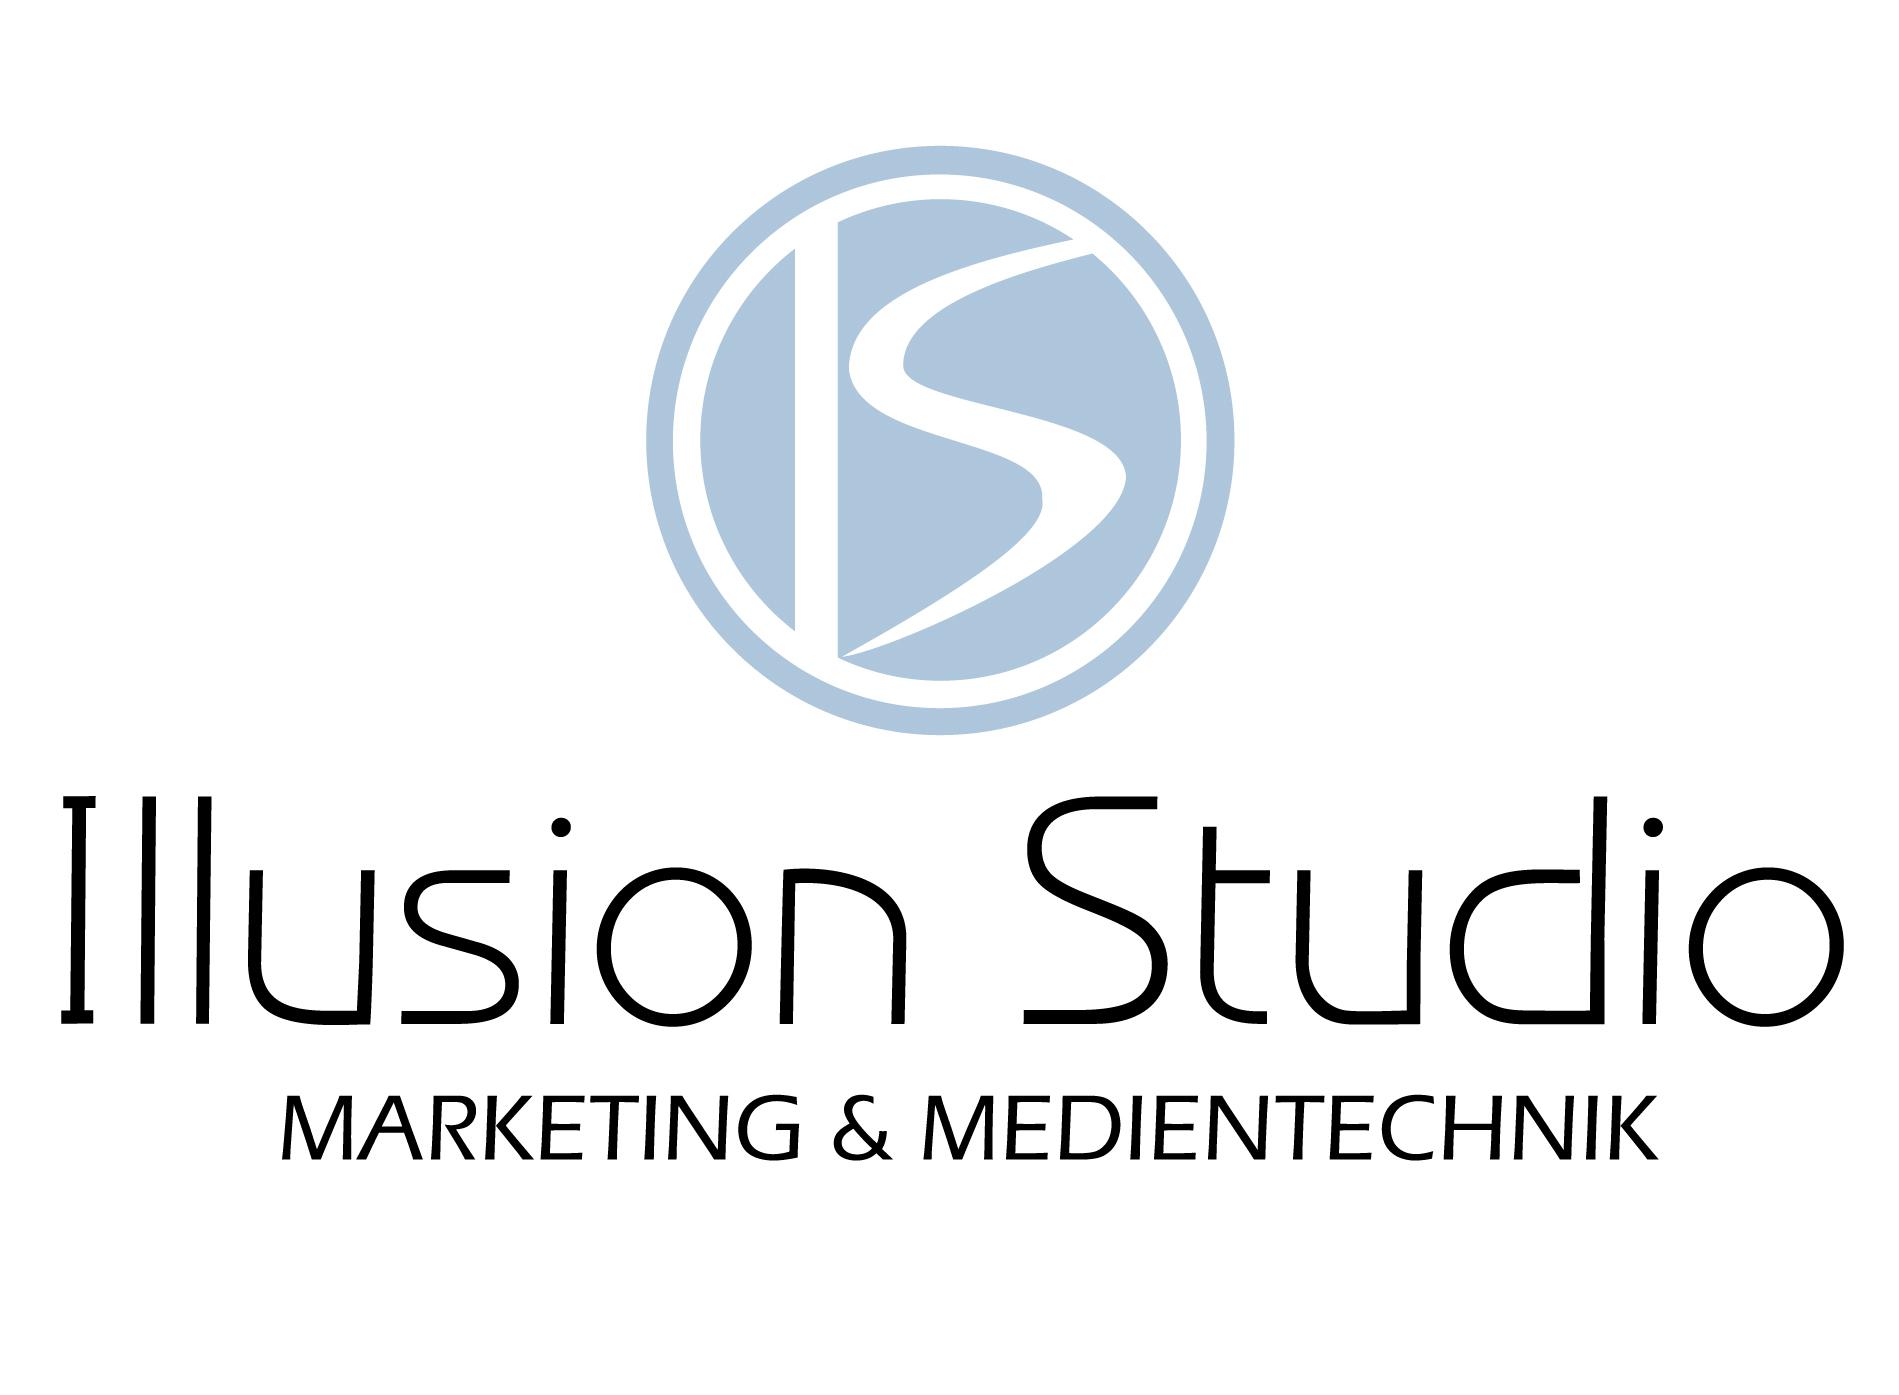 Illusion Studio - Marketing & Medientechnik